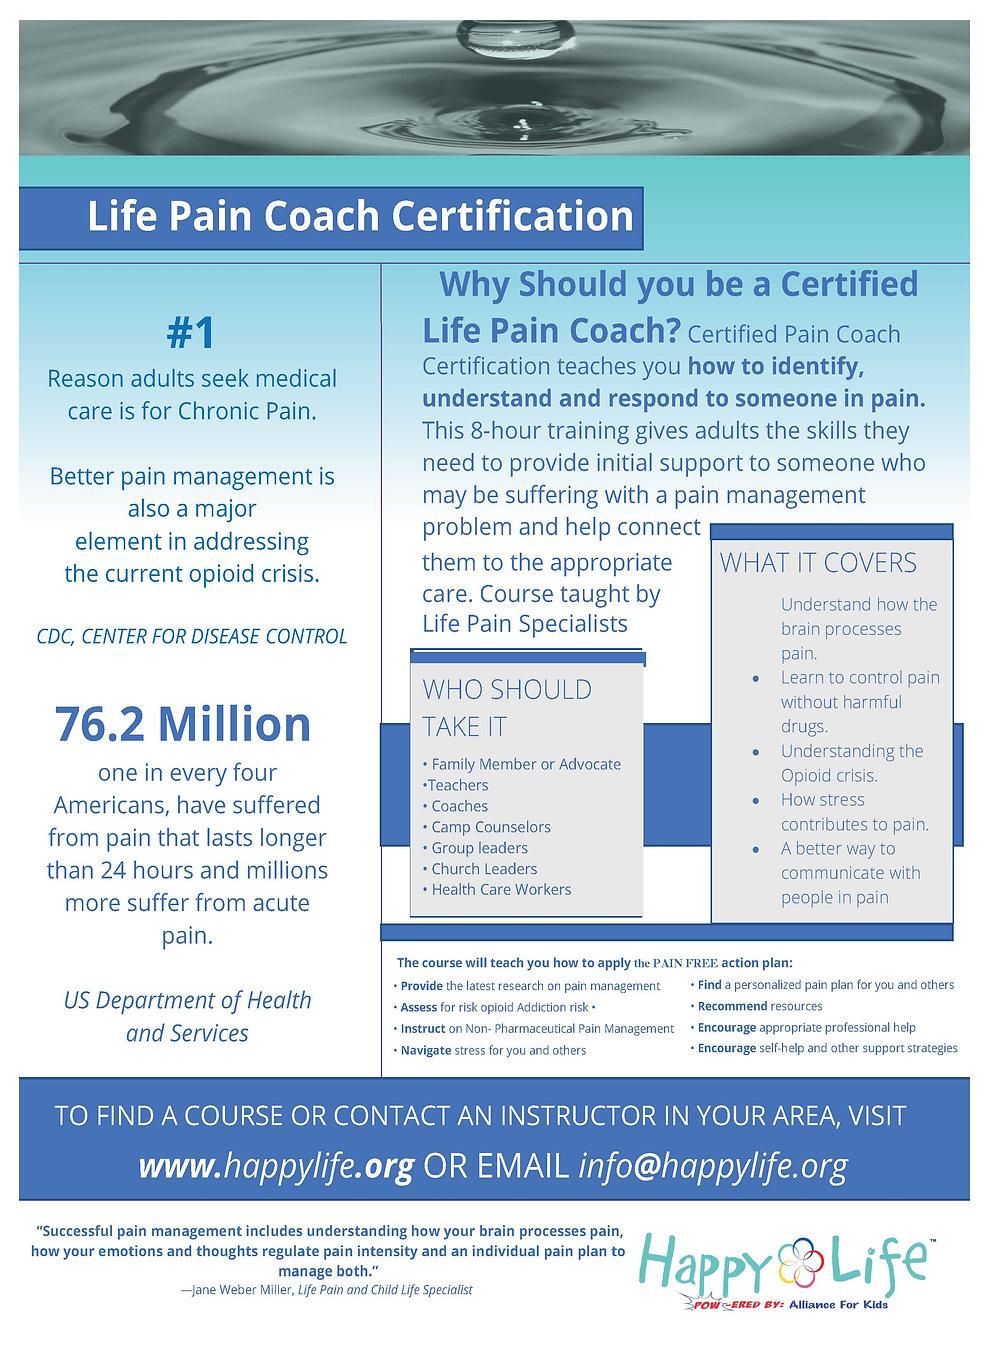 Life Pain Coach Flyer.jpg